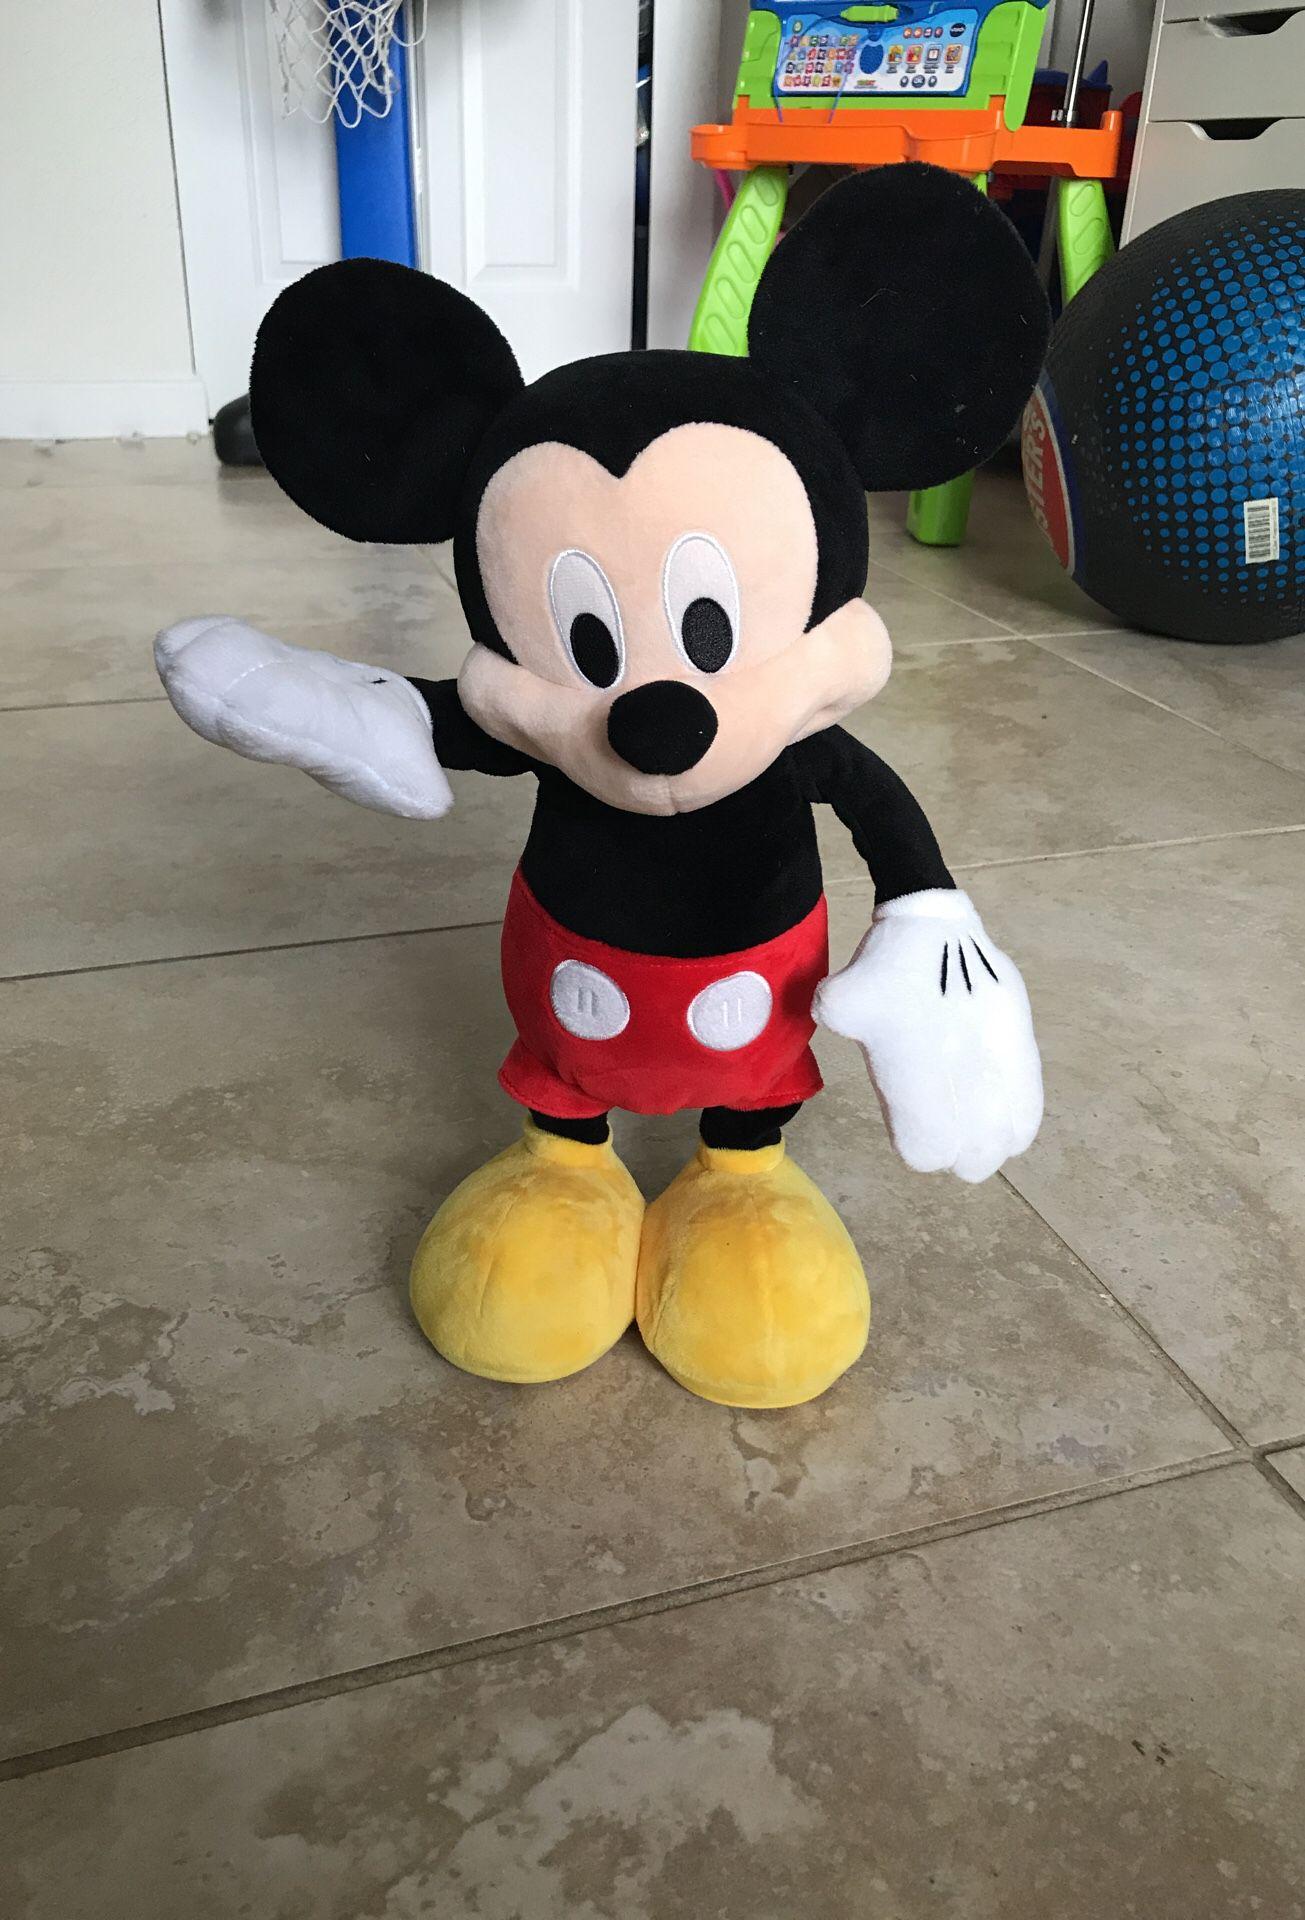 Dancing hot dog diggity dog Mickey Mouse